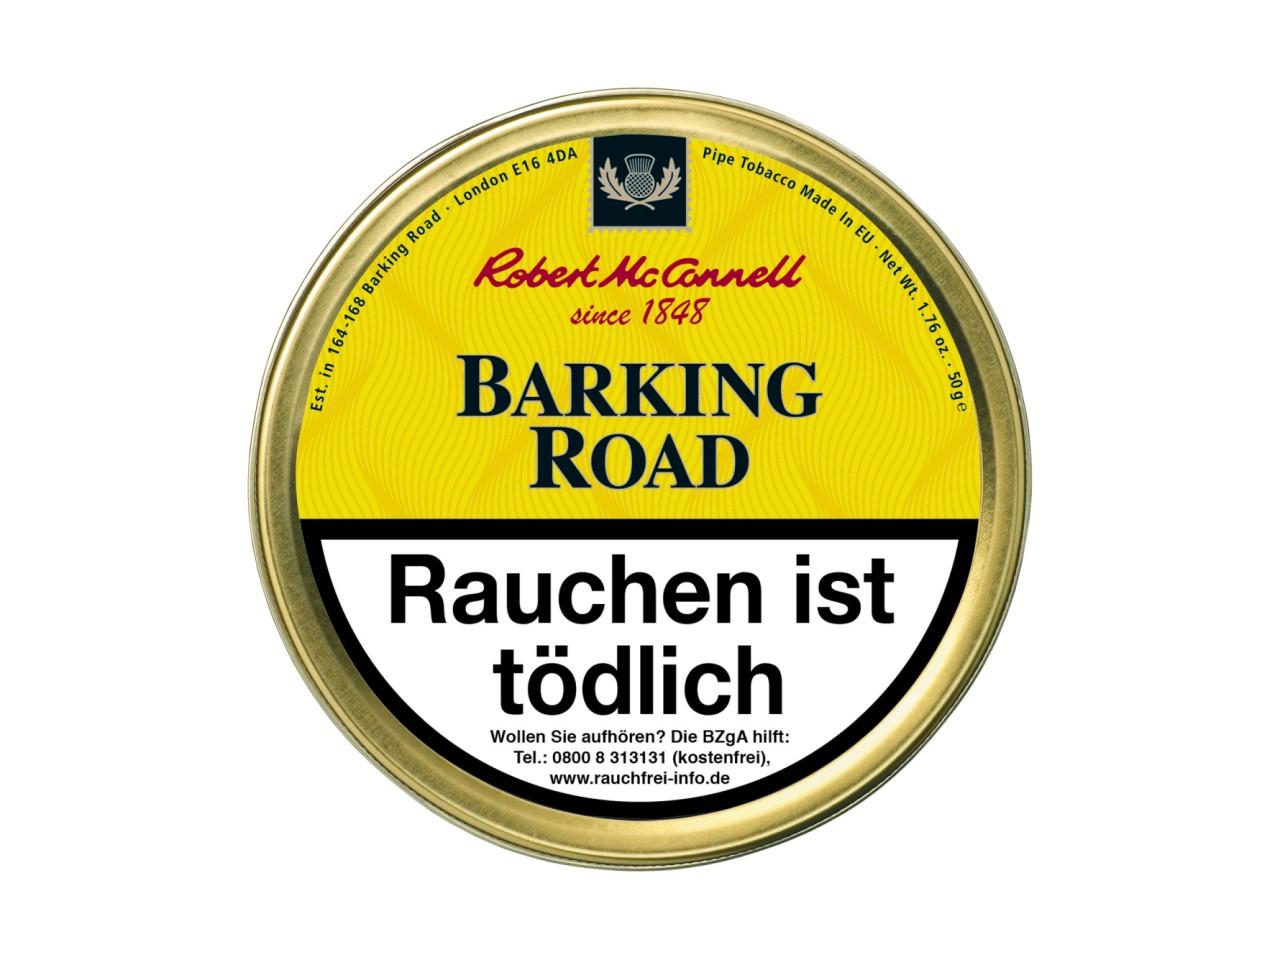 Robert McConnell Barking Road